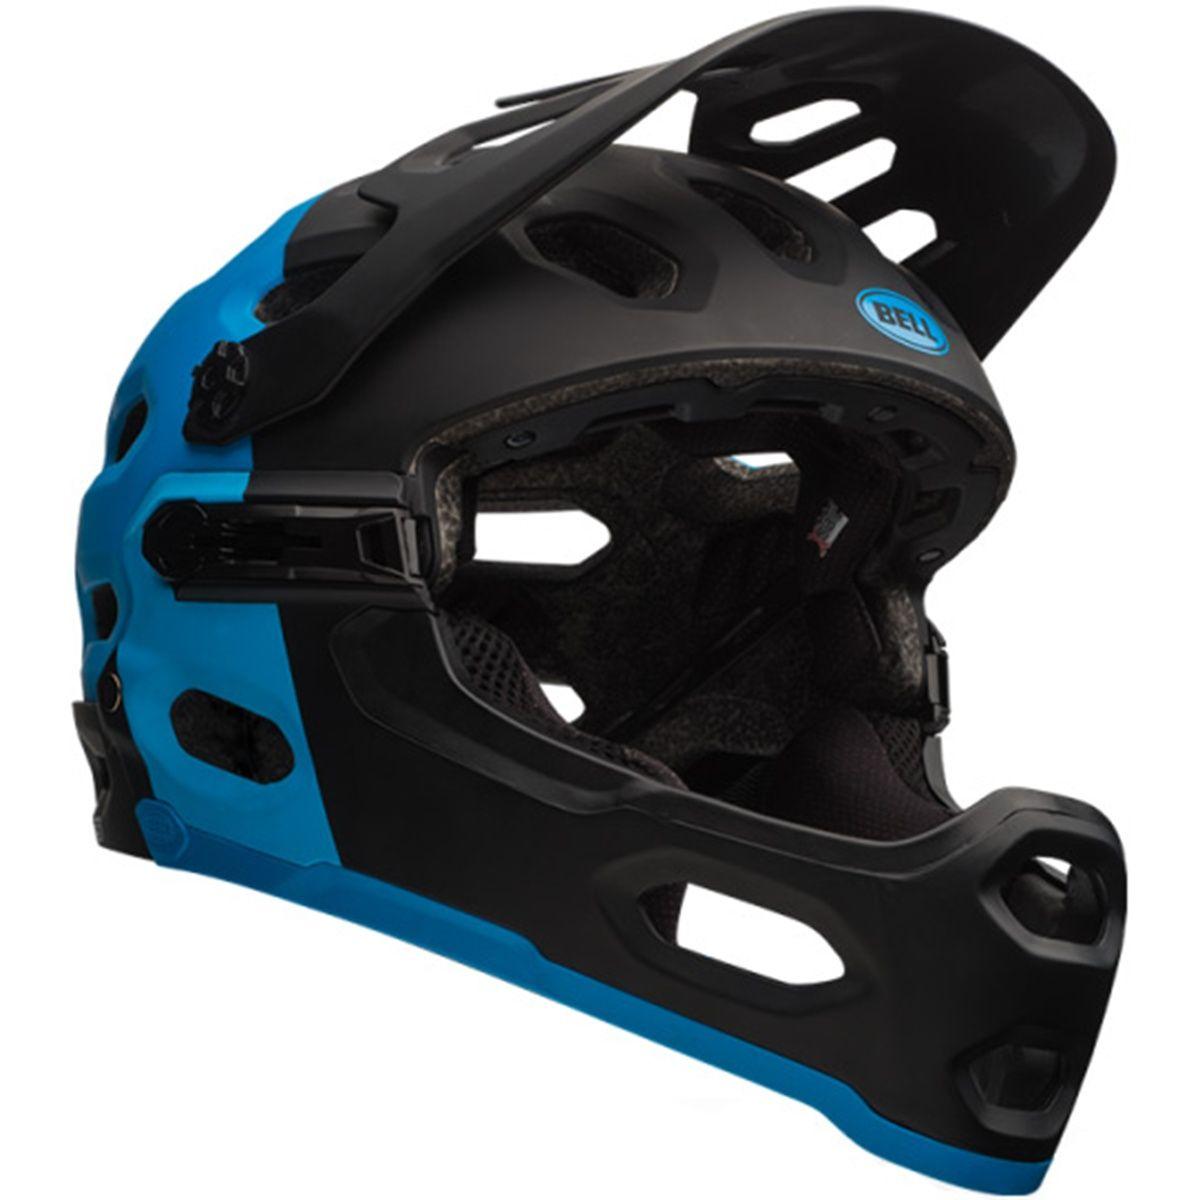 casco bell super 2r mips 2016 equipped matte black blue. Black Bedroom Furniture Sets. Home Design Ideas